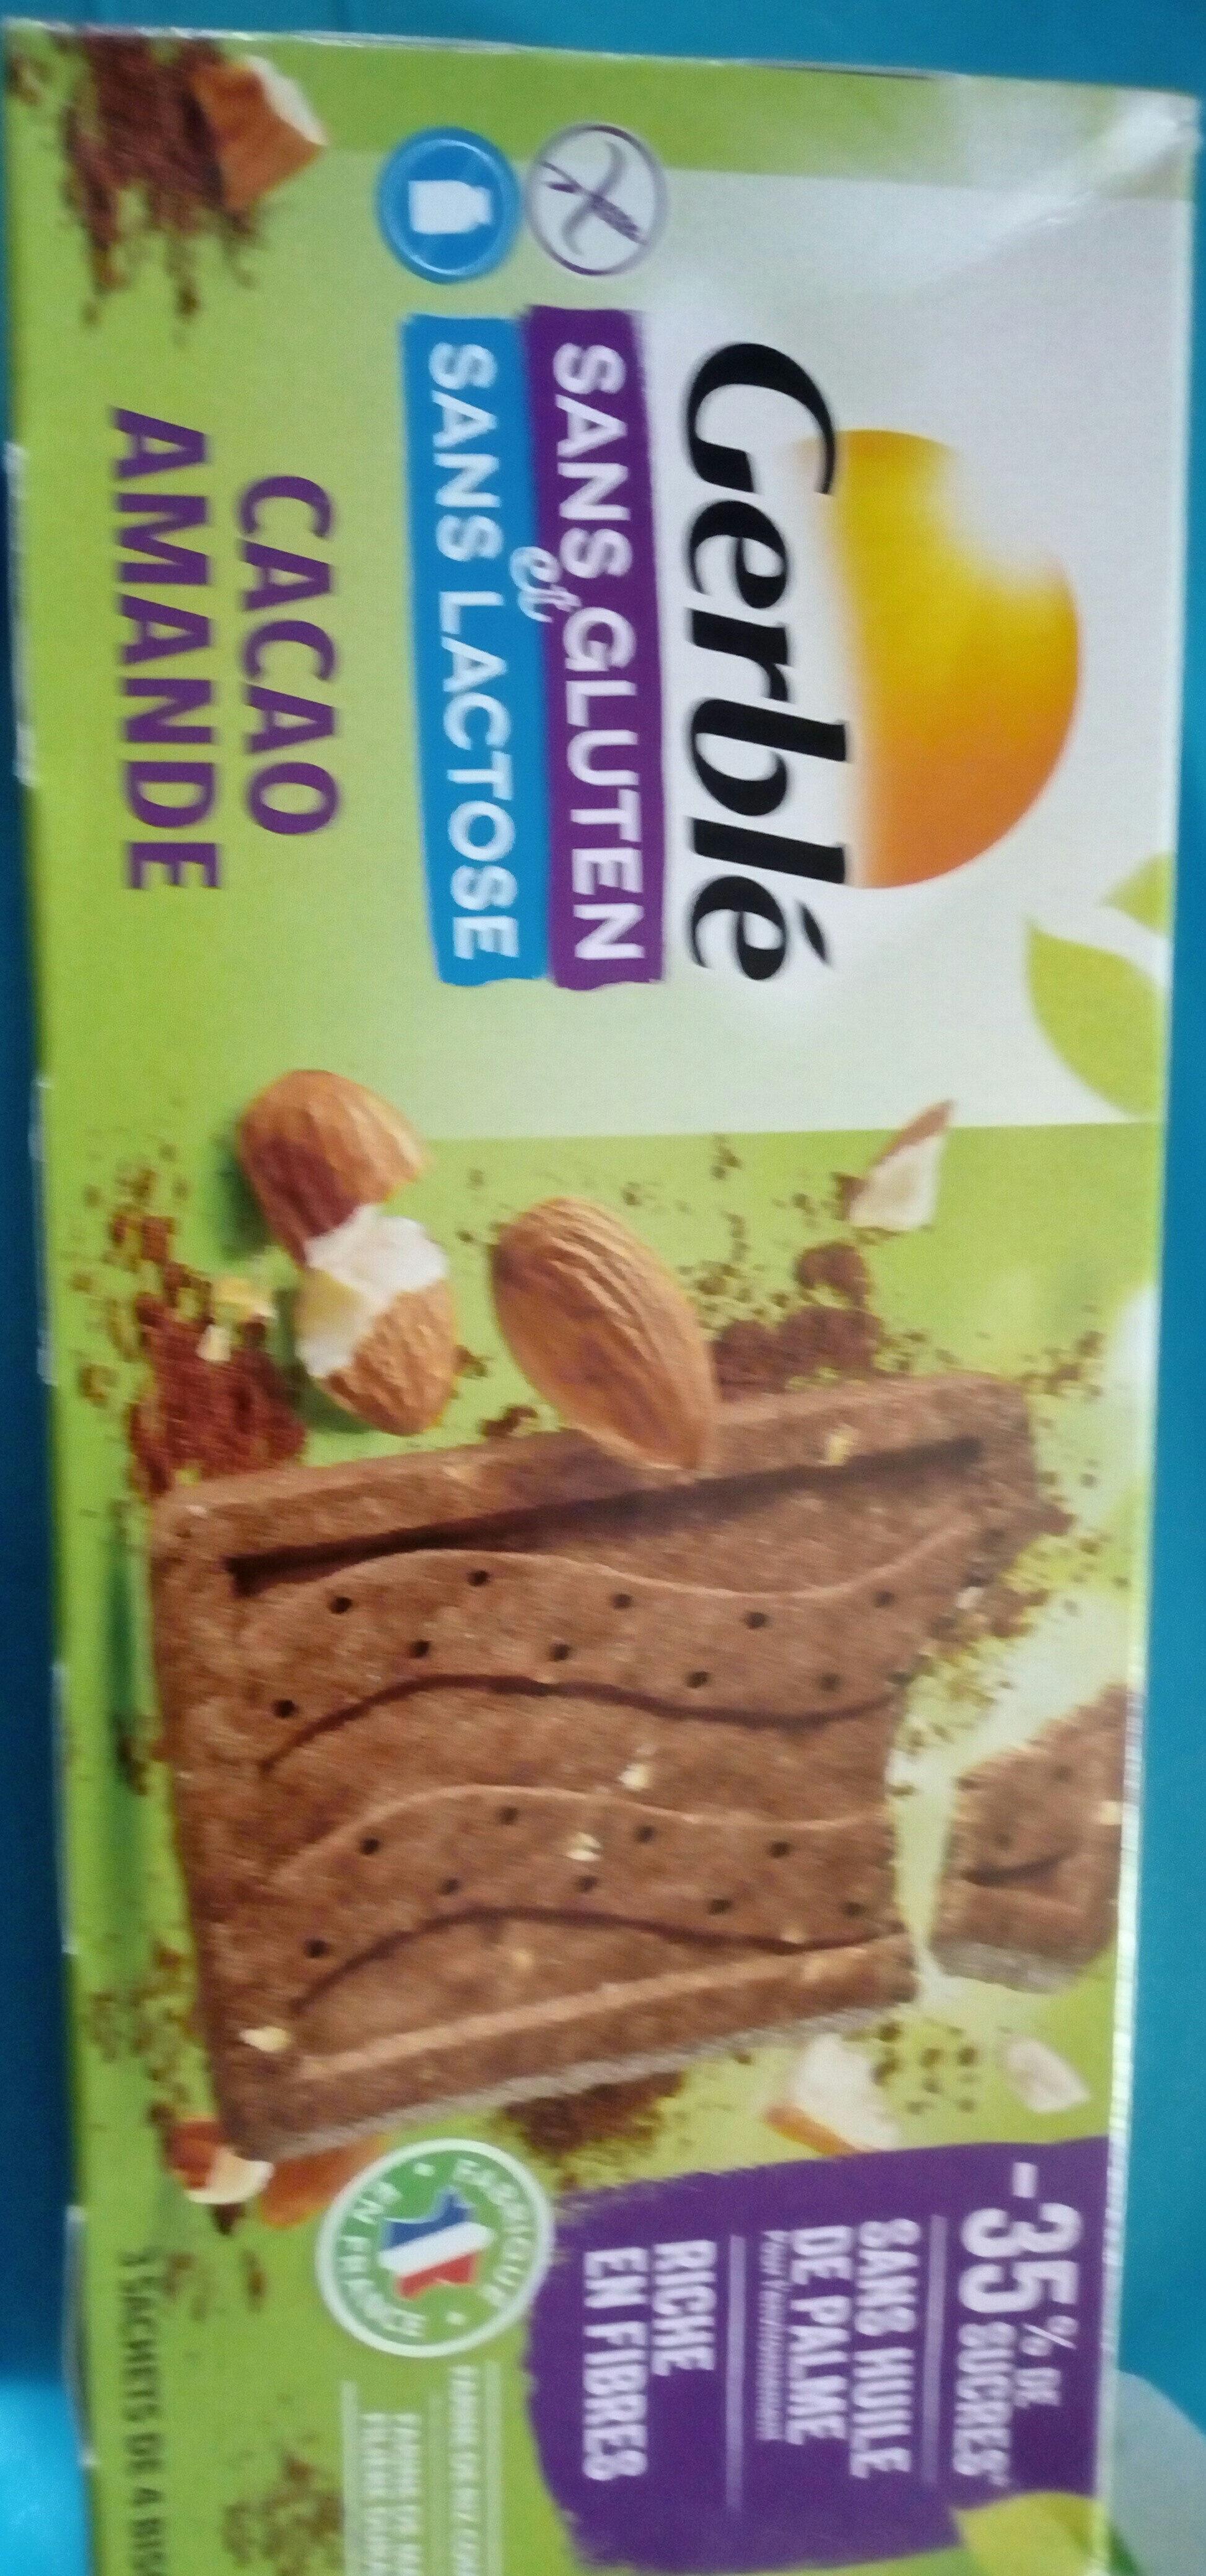 Biscuits Cacao Amande - Produit - fr